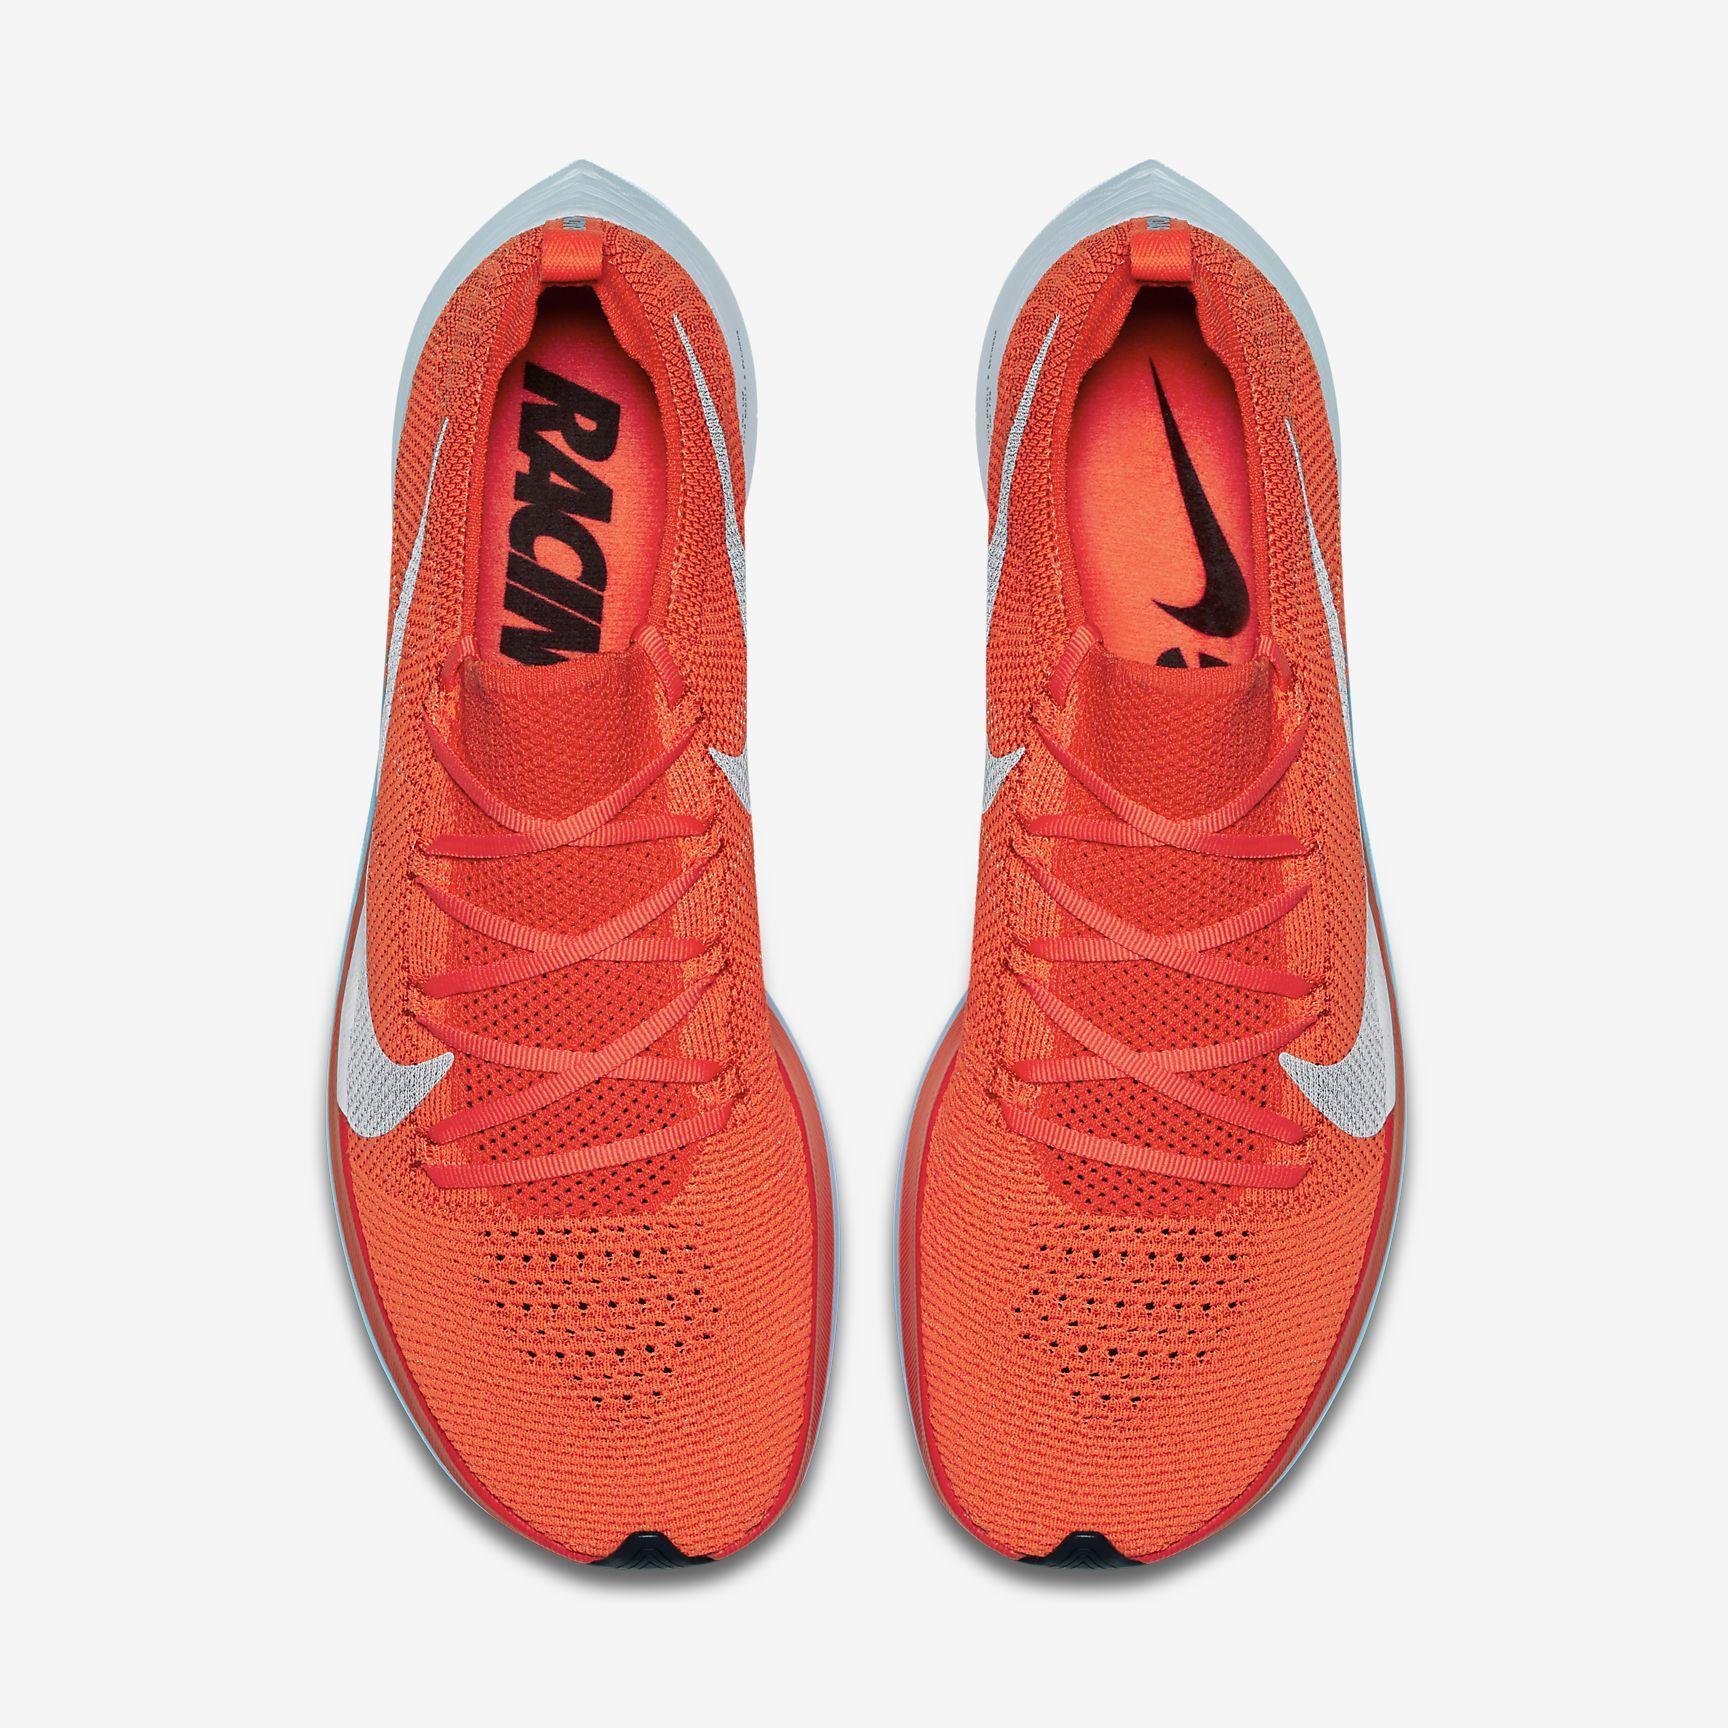 e63e73b4b38cd Nike VaporFly 4% Flyknit Laufschuh (Unisex)